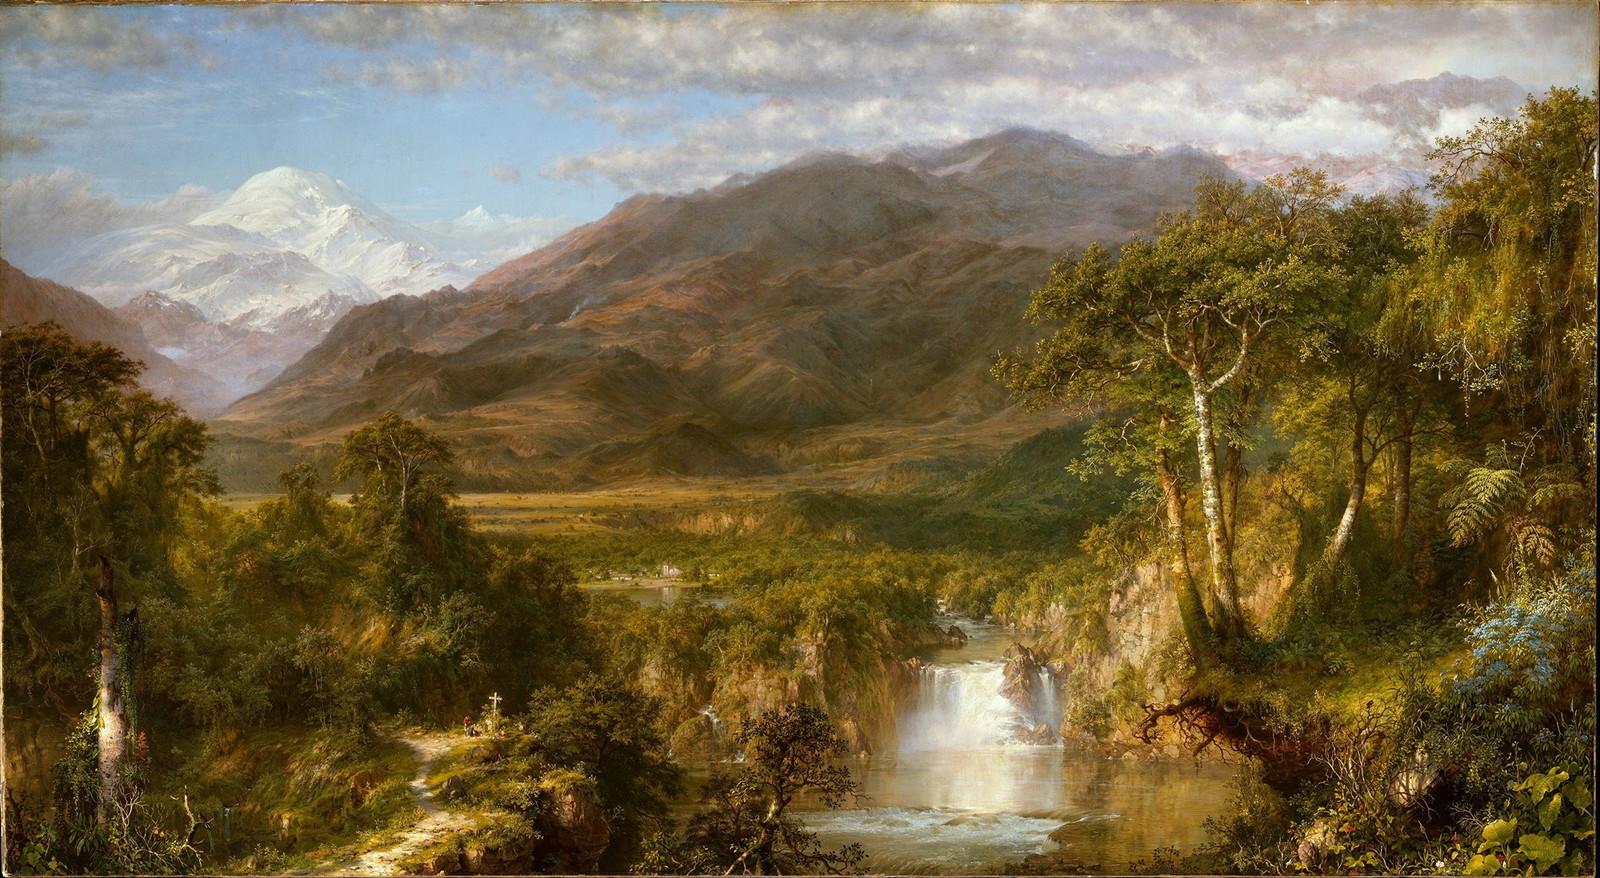 Обои водопад, Пейзаж, картина, Сердце Анд, Фредерик Эдвин Чёрч. Разное foto 7